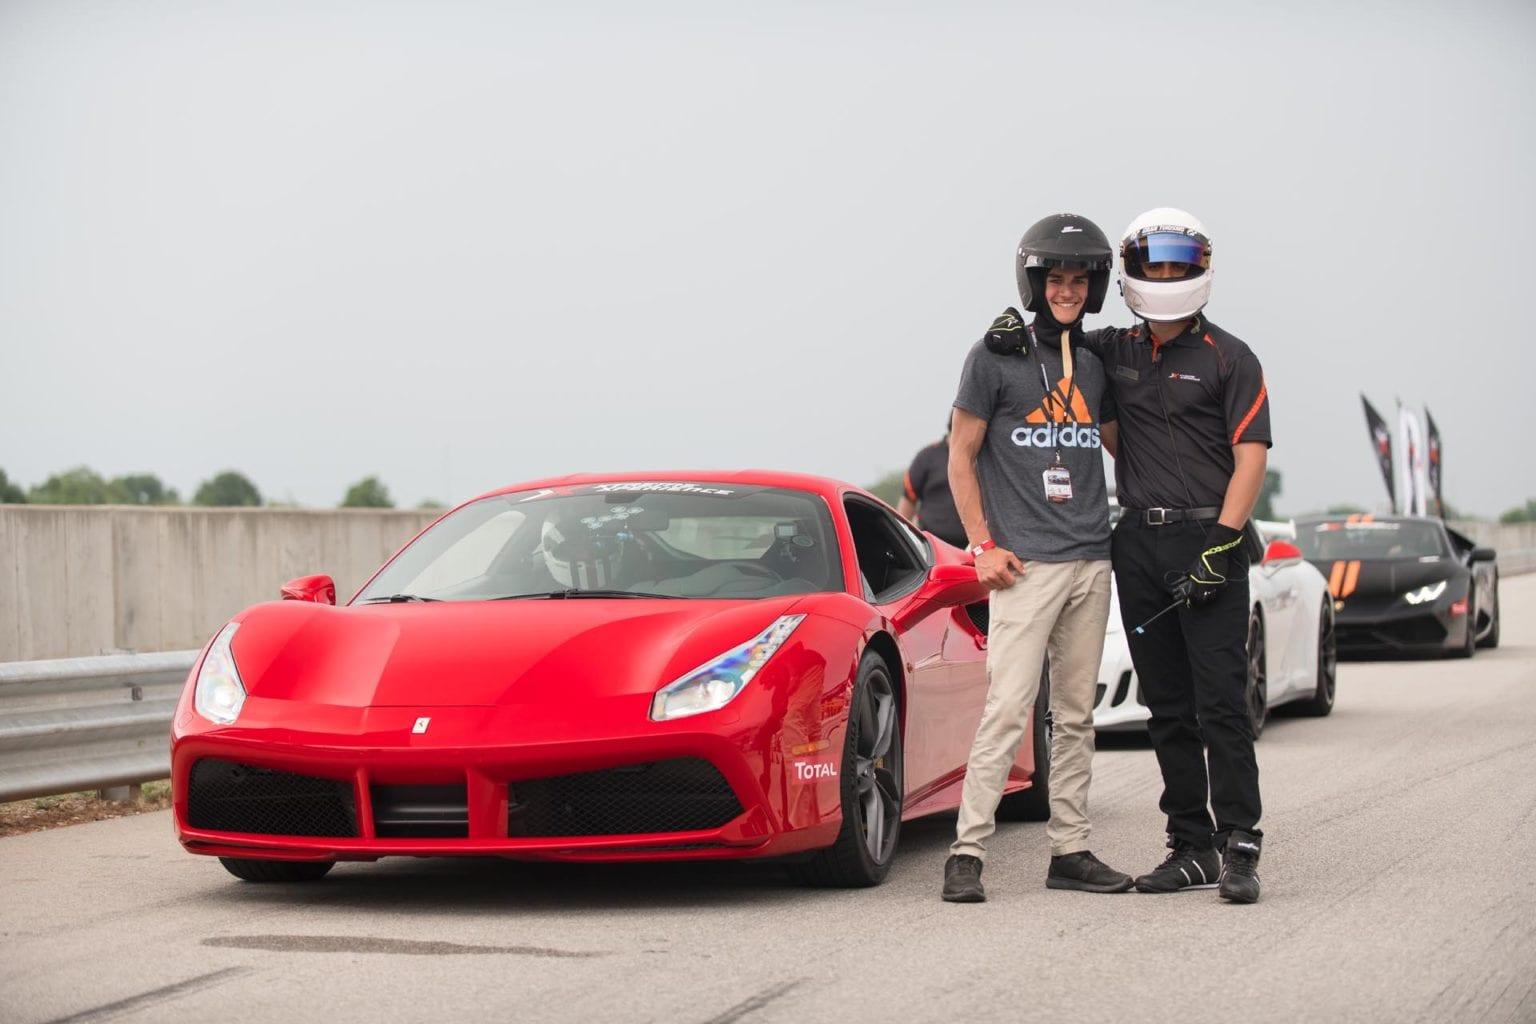 racers next to car